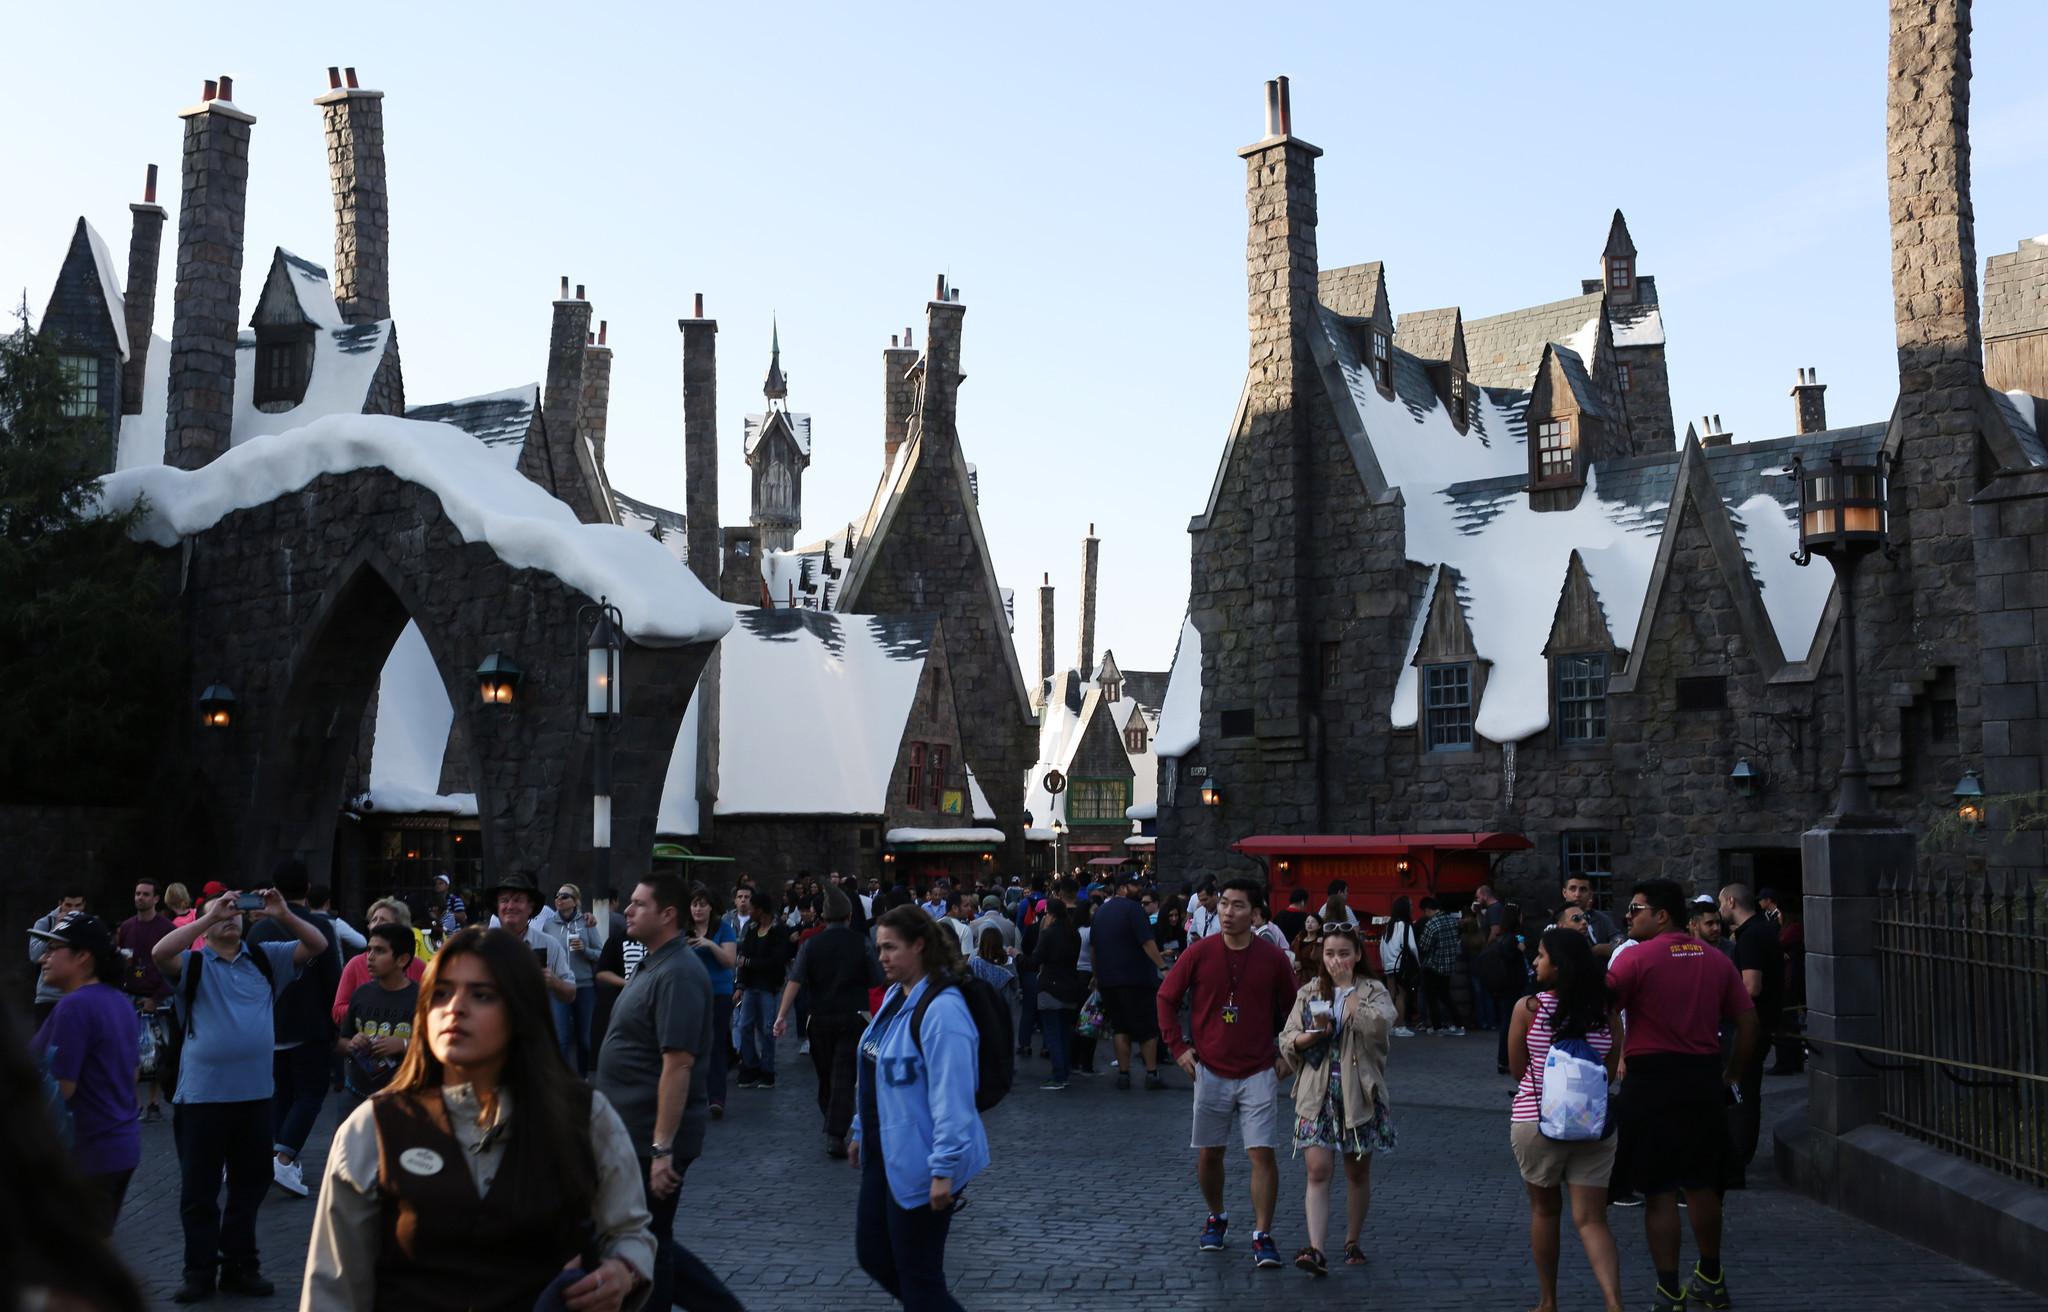 wizarding world harry potter three broomsticks